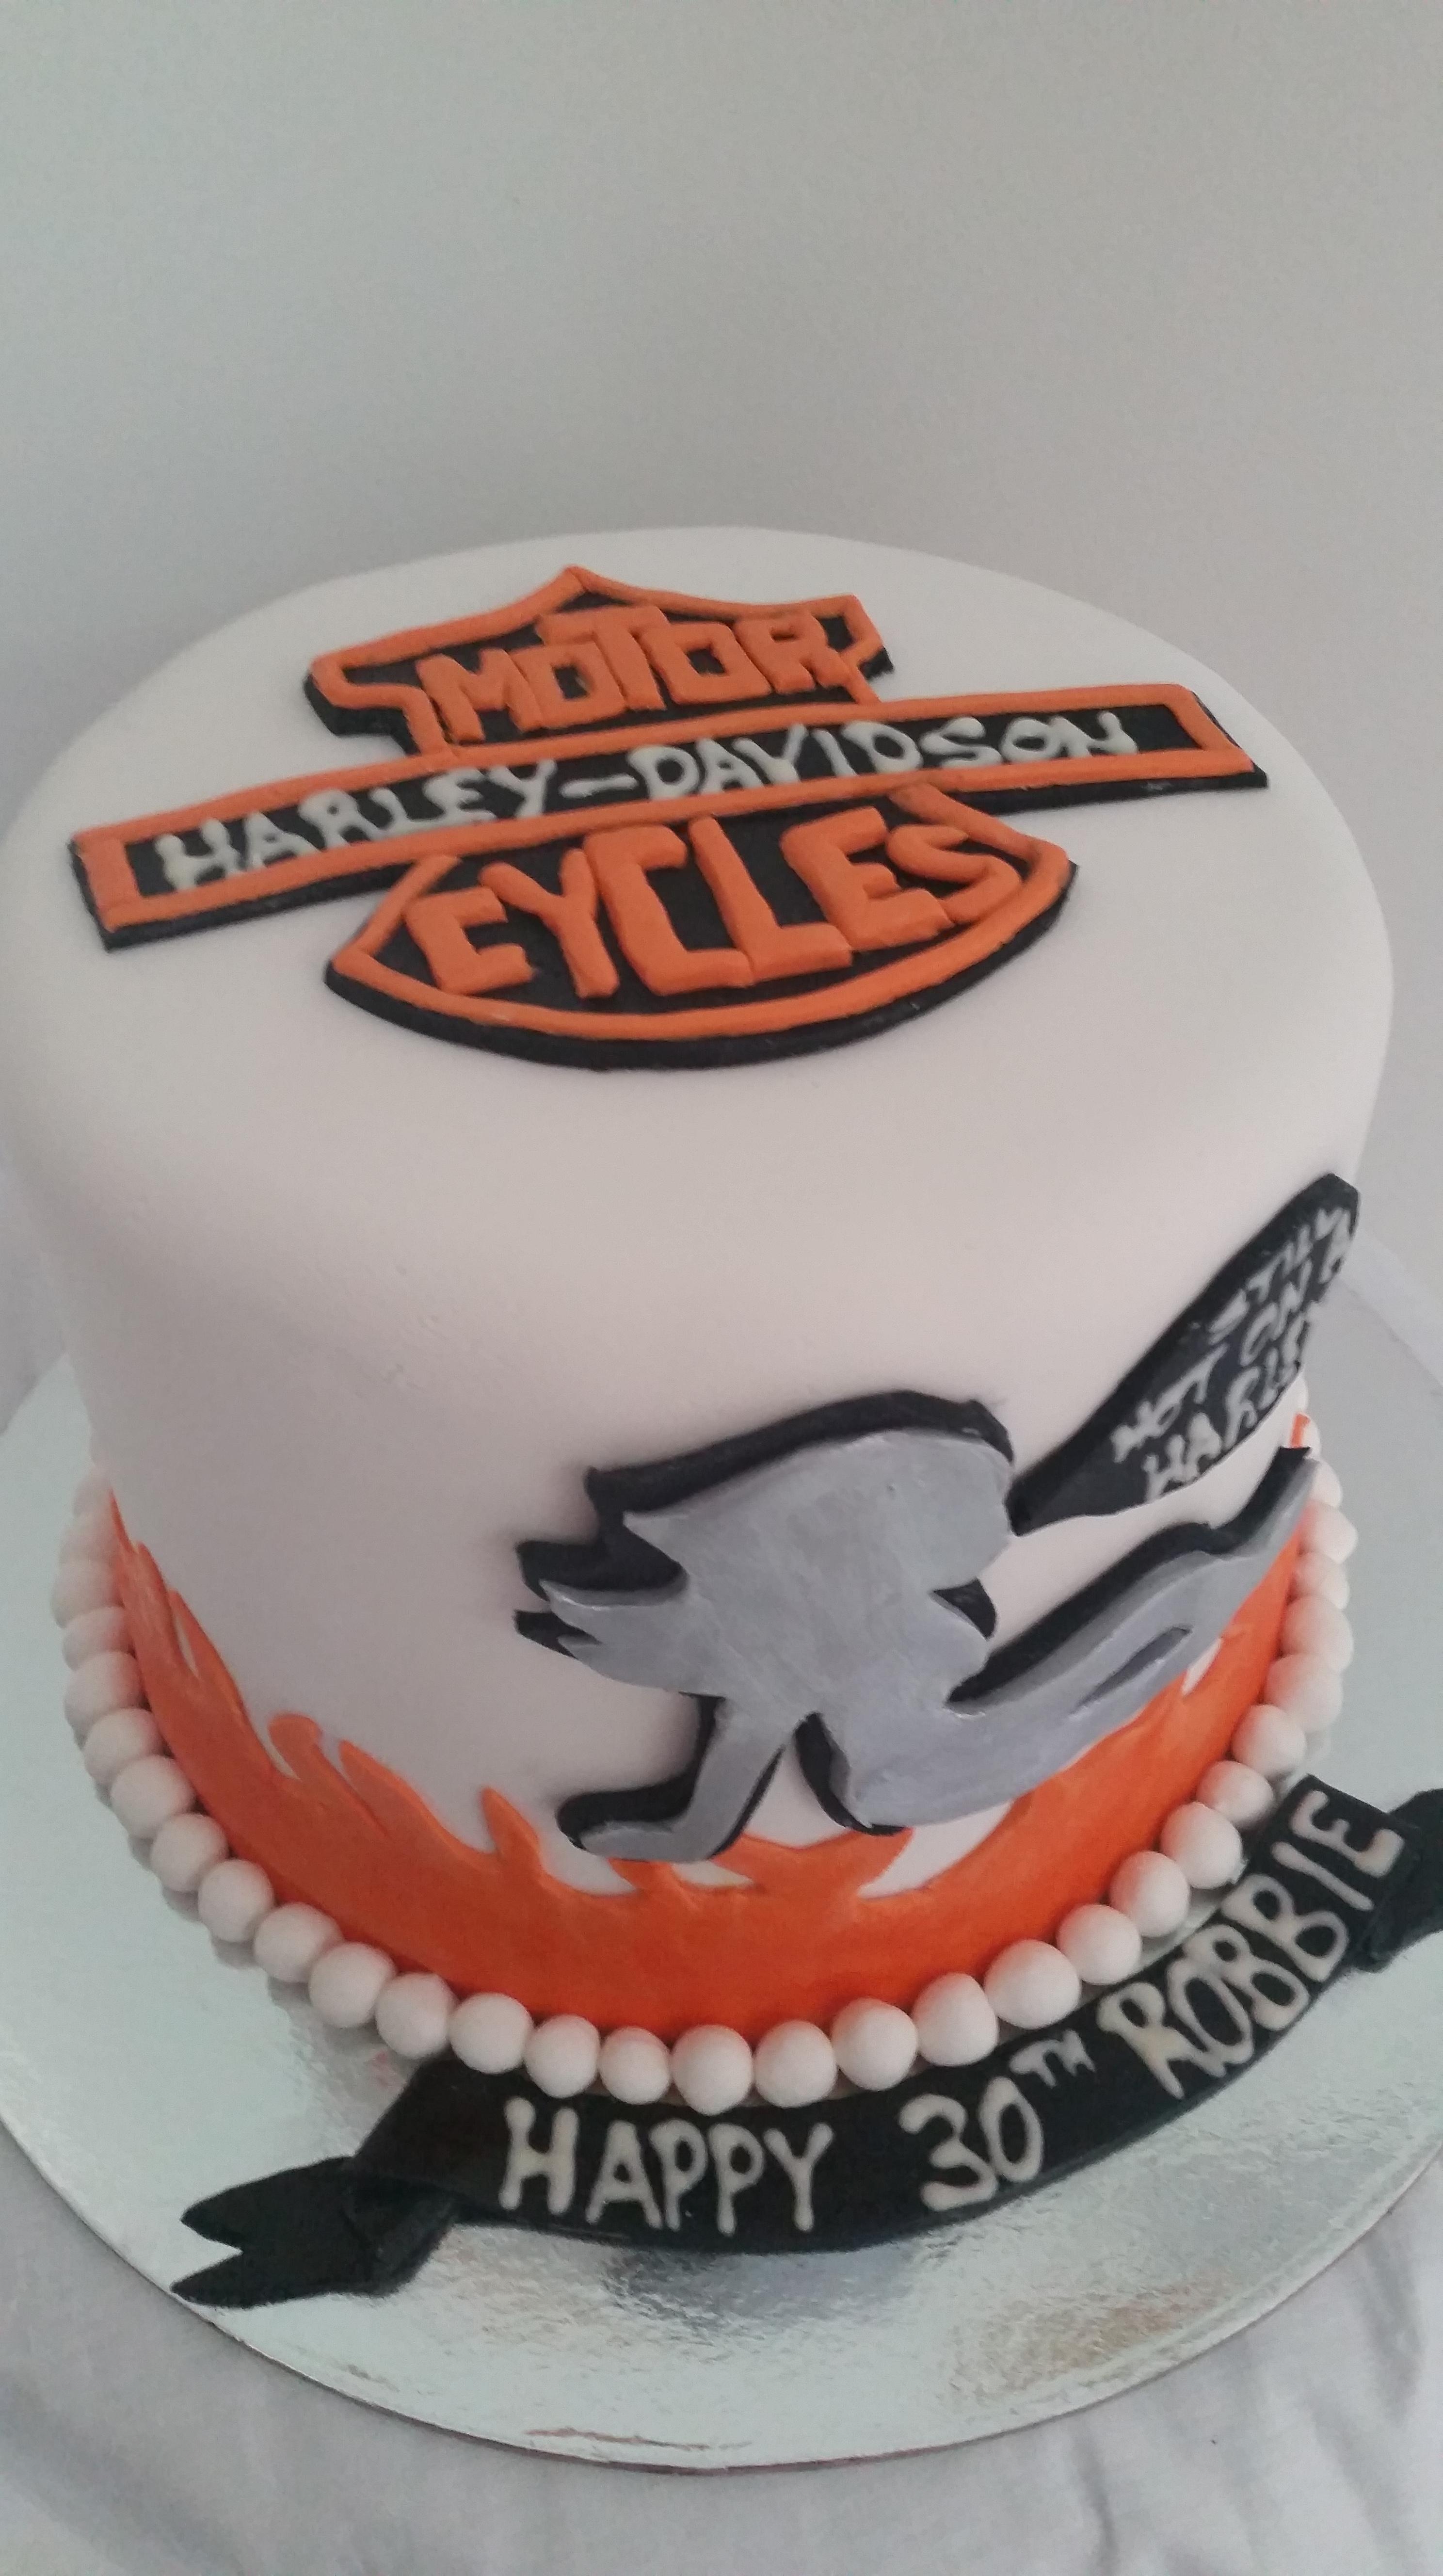 Harley Davidson Cake Decorations Nikkies Novelty Cakes Novelty Cakes And Cupcakes For Any Occasion